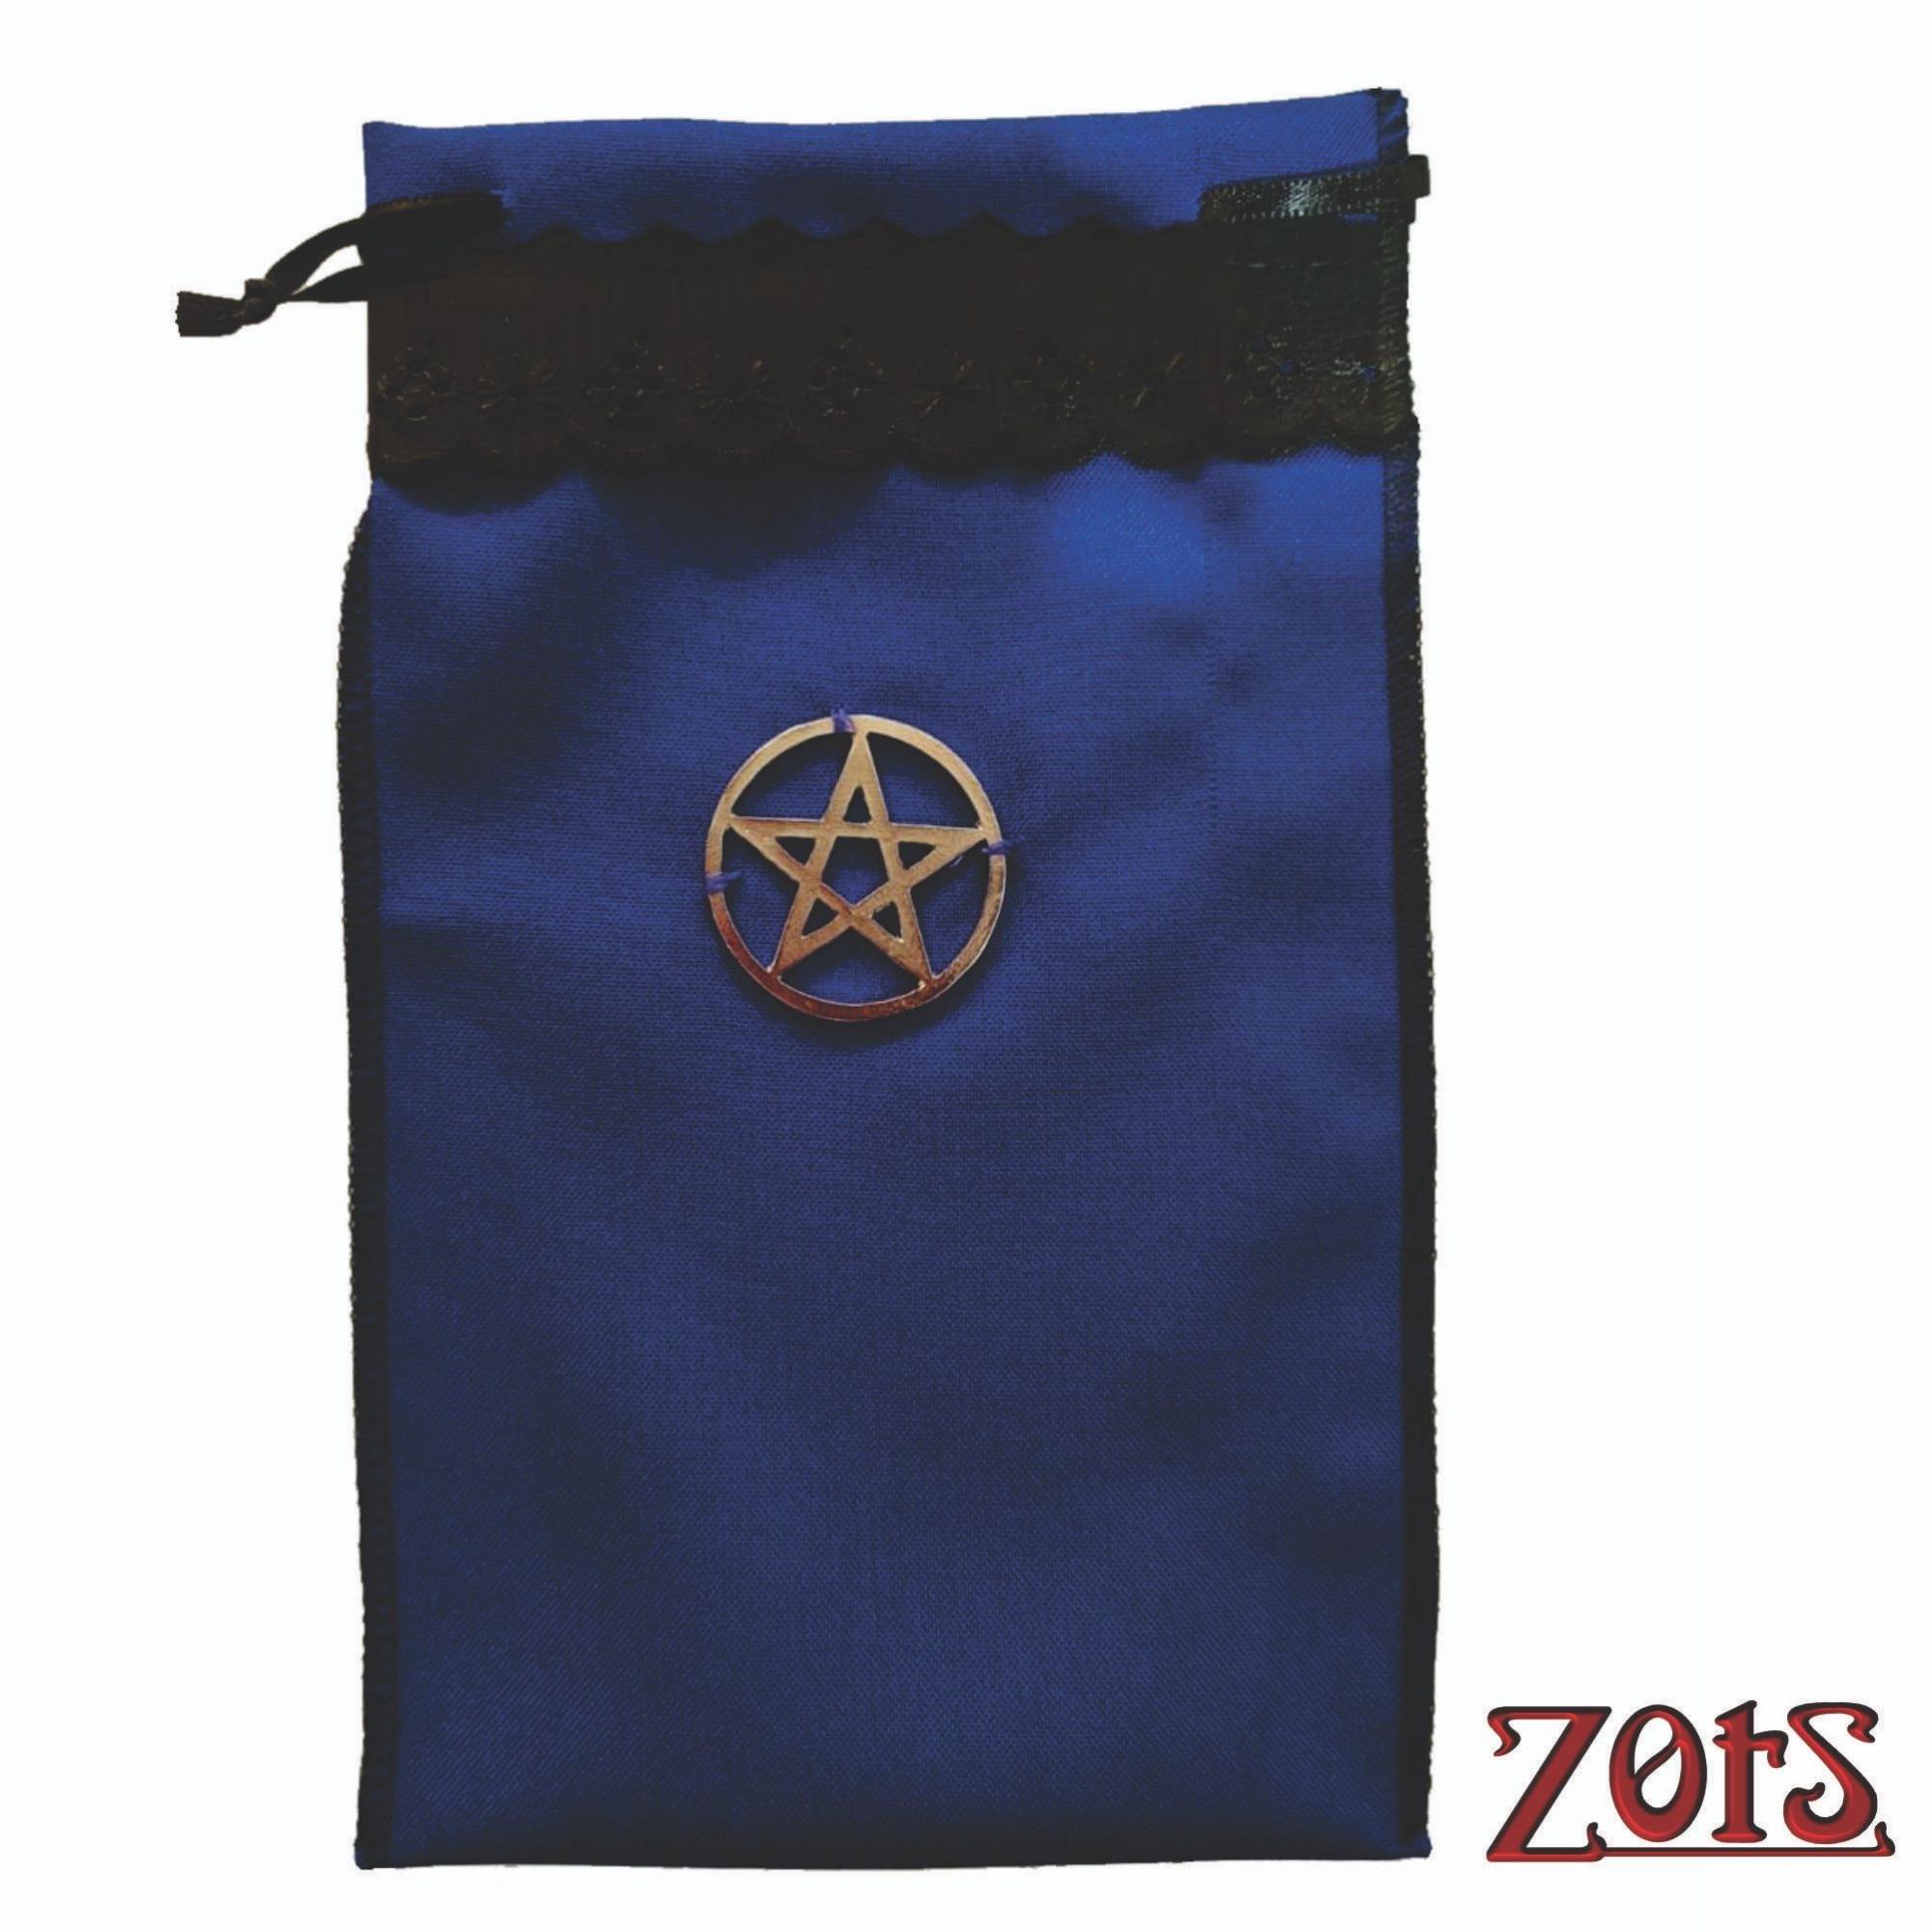 Saco Tarô com Pentagrama  -  Zots